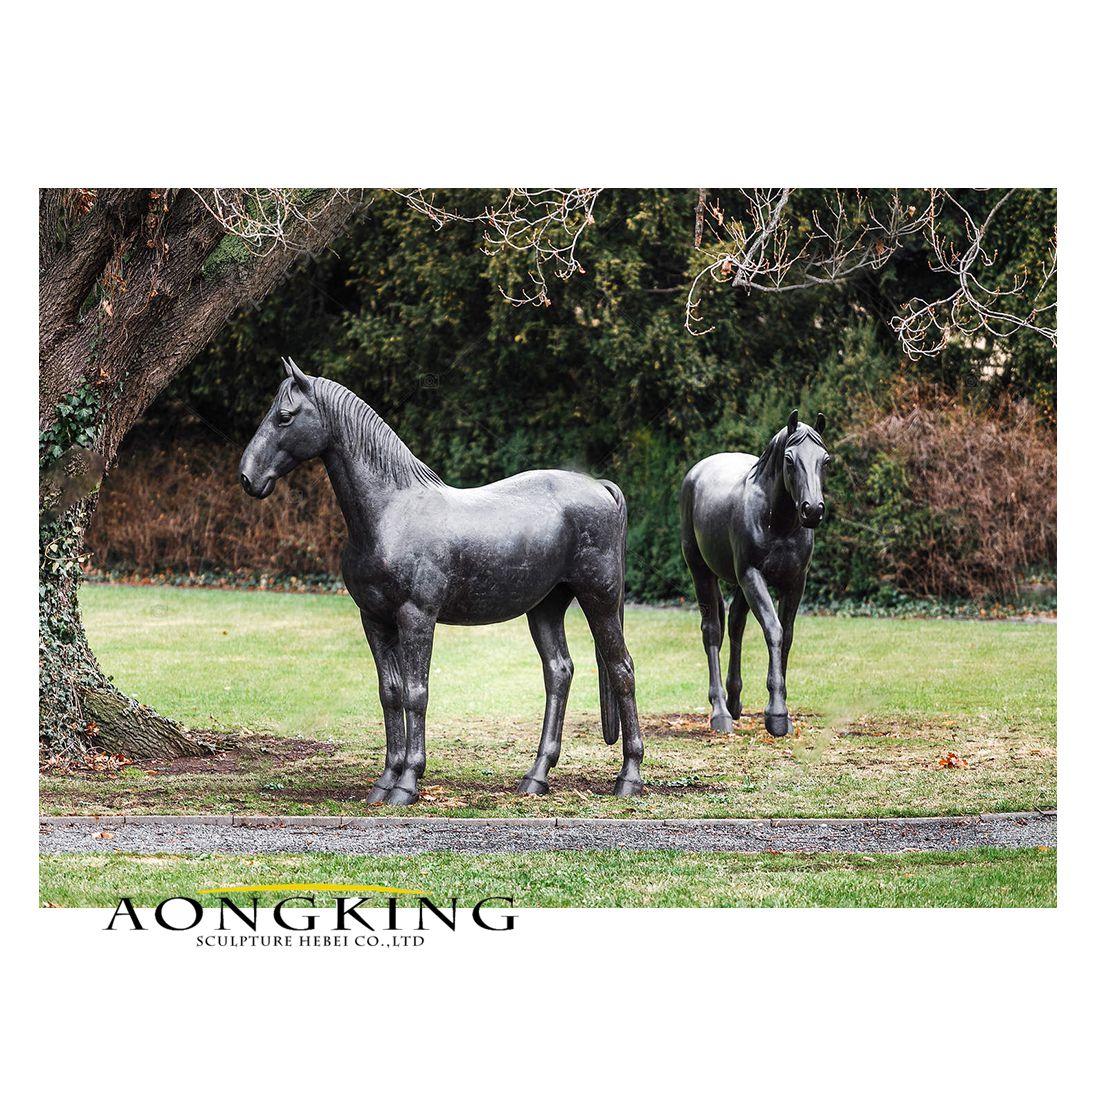 Horses statue in spring park